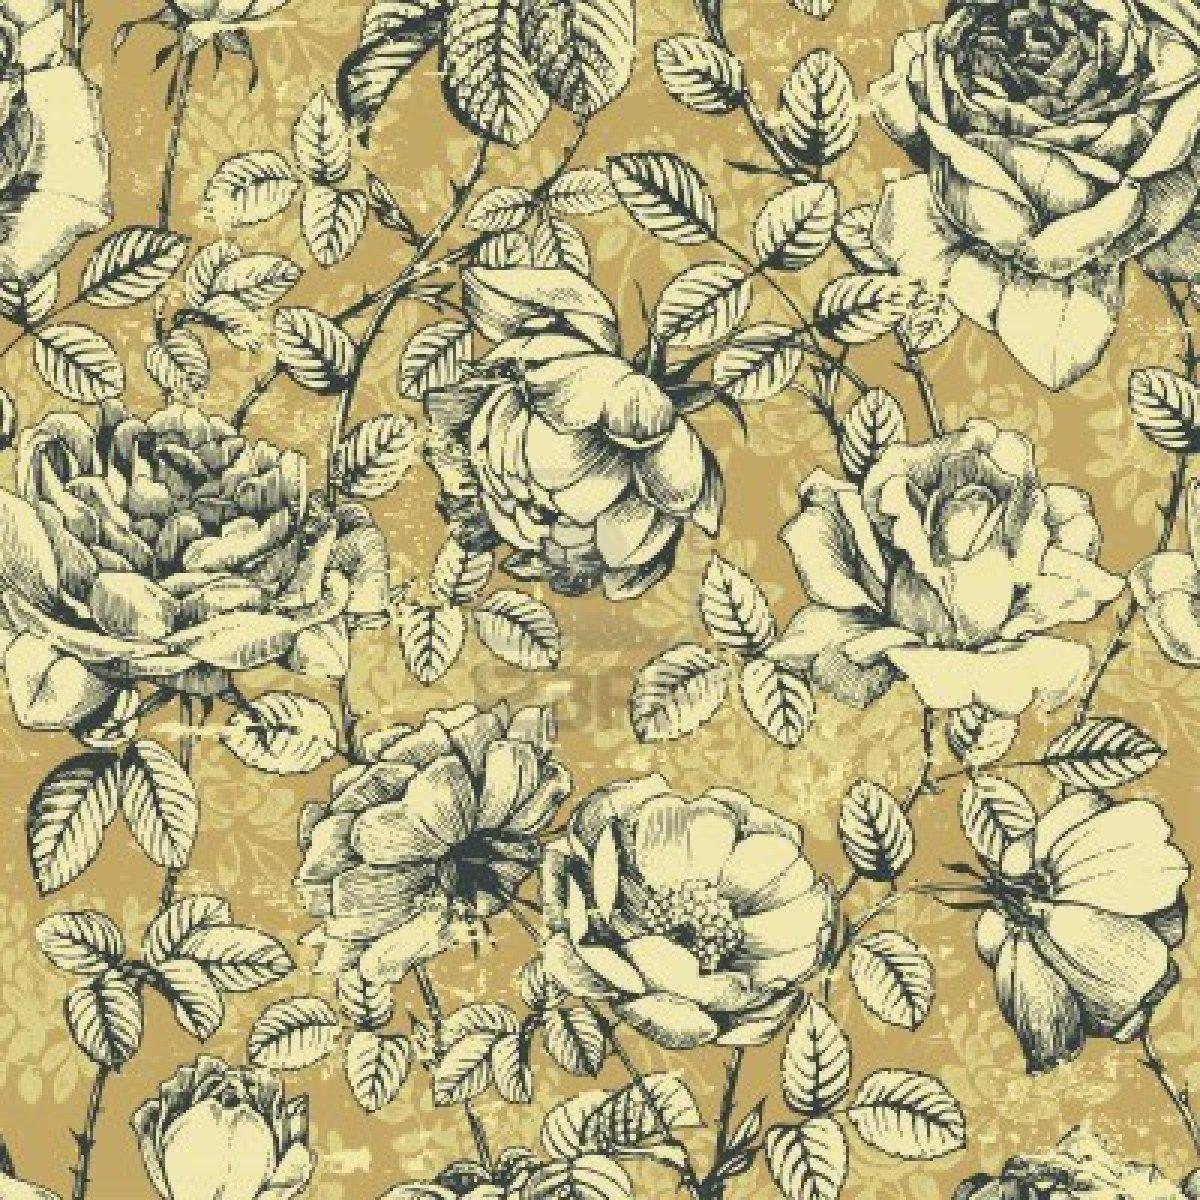 Vintage Floral Nail Art 1200x1200